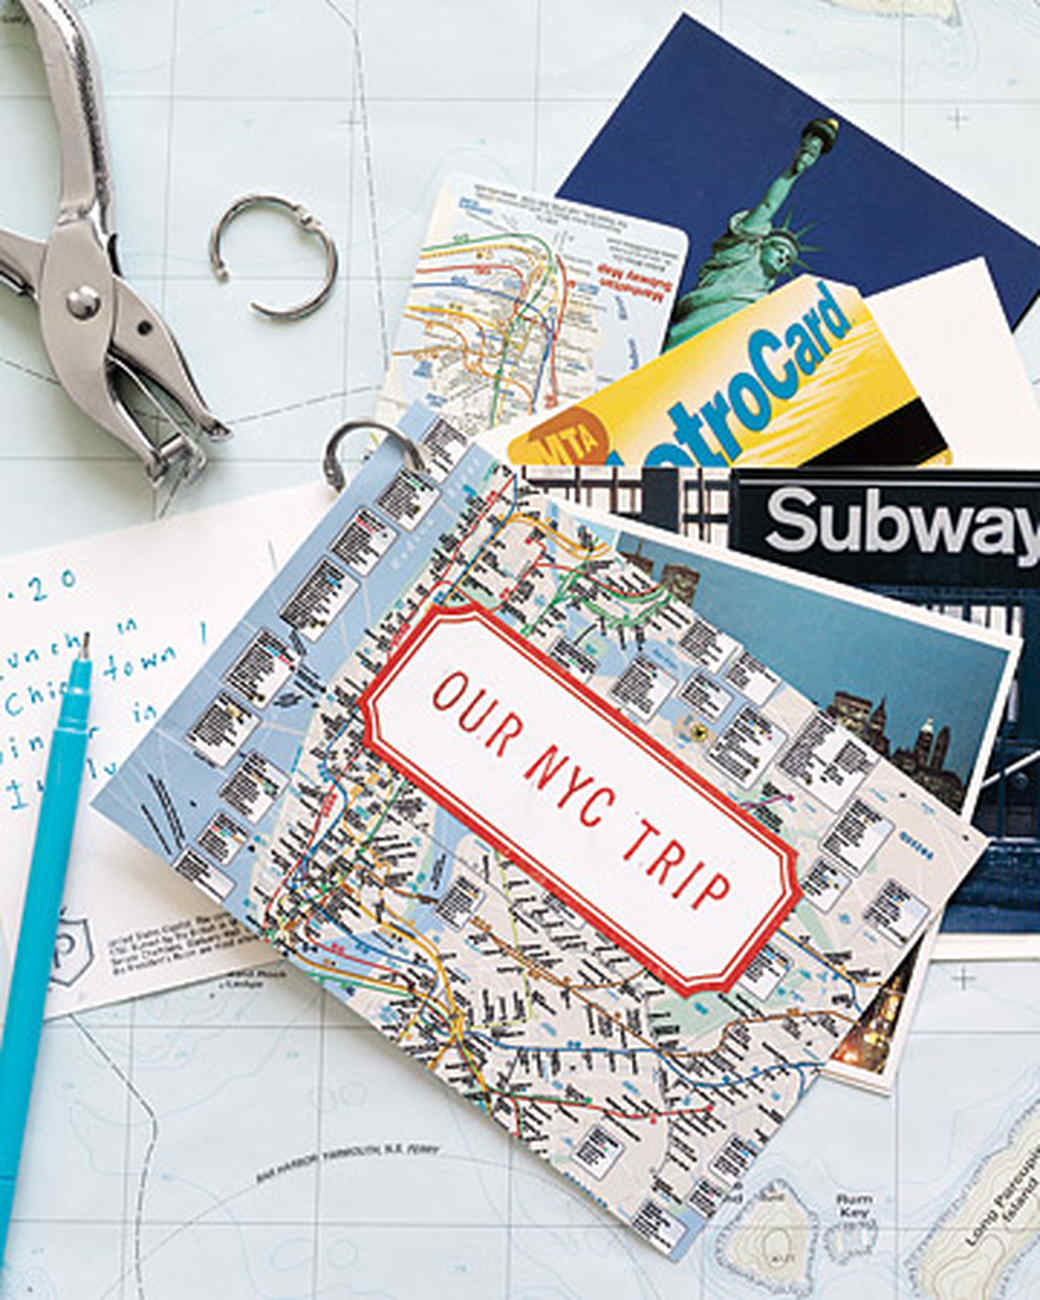 mld103351_0608_postcards.jpg